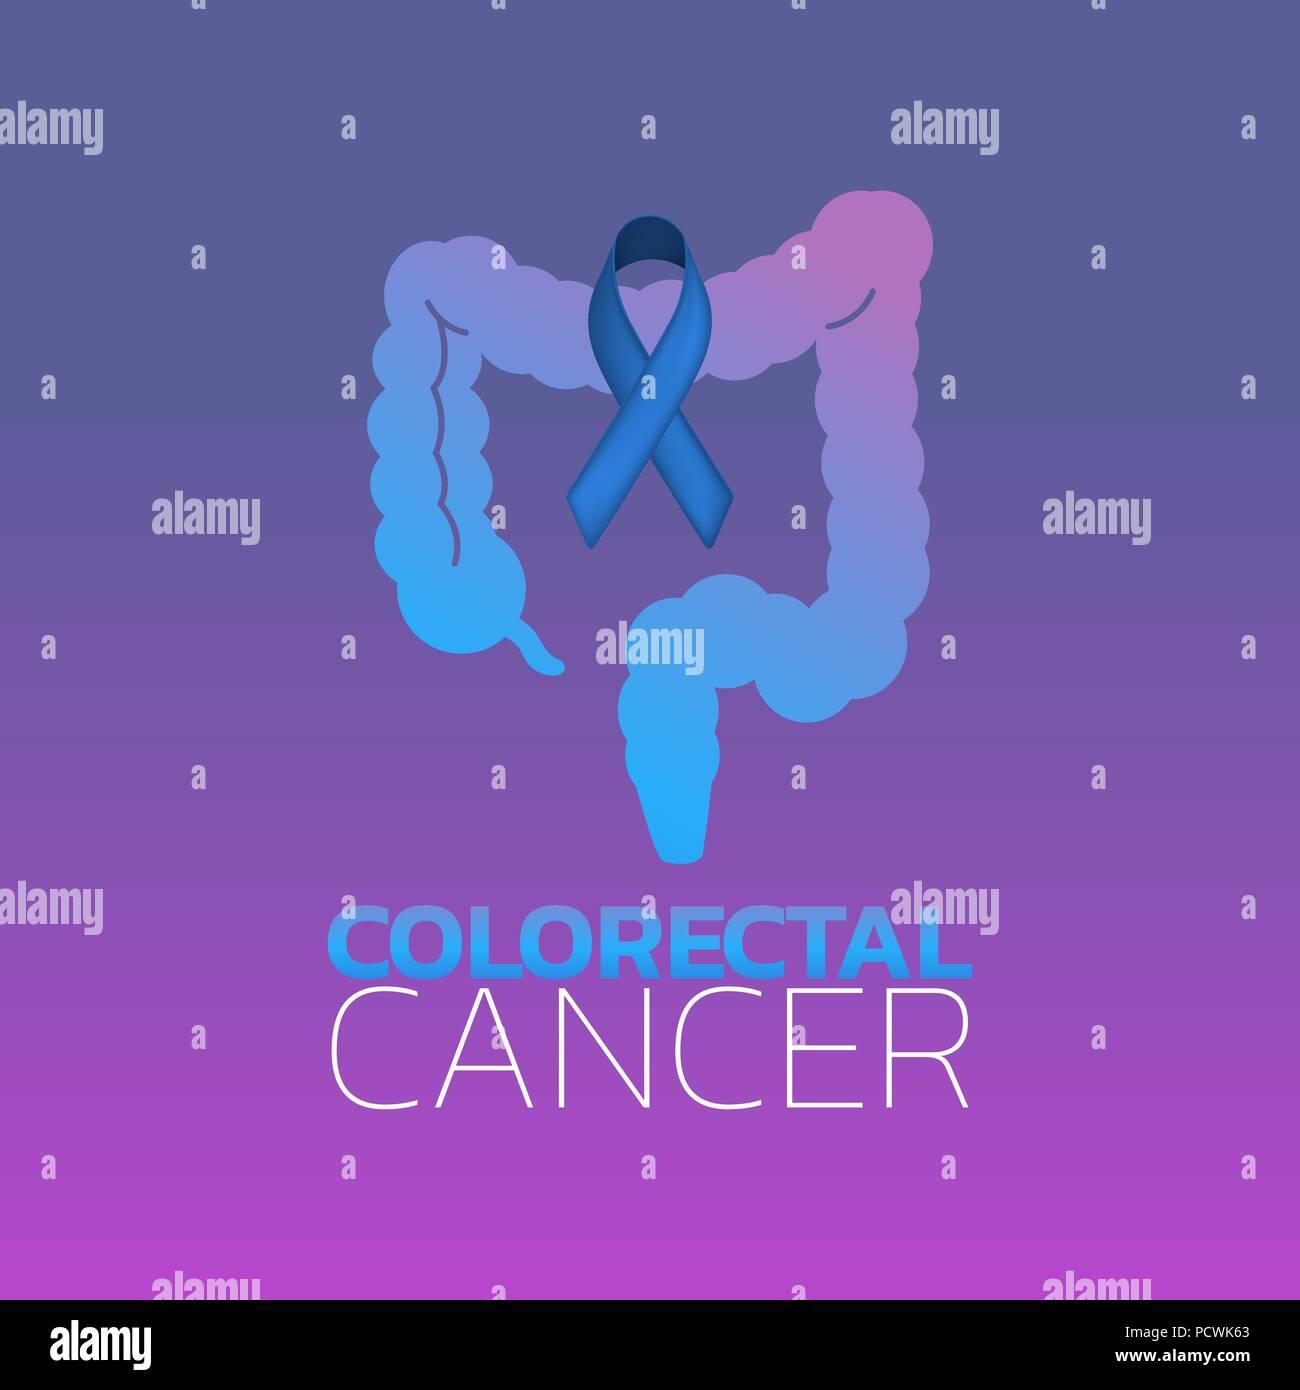 Colorectal Cancer Icon Design Vector Illustration Stock Vector Image Art Alamy